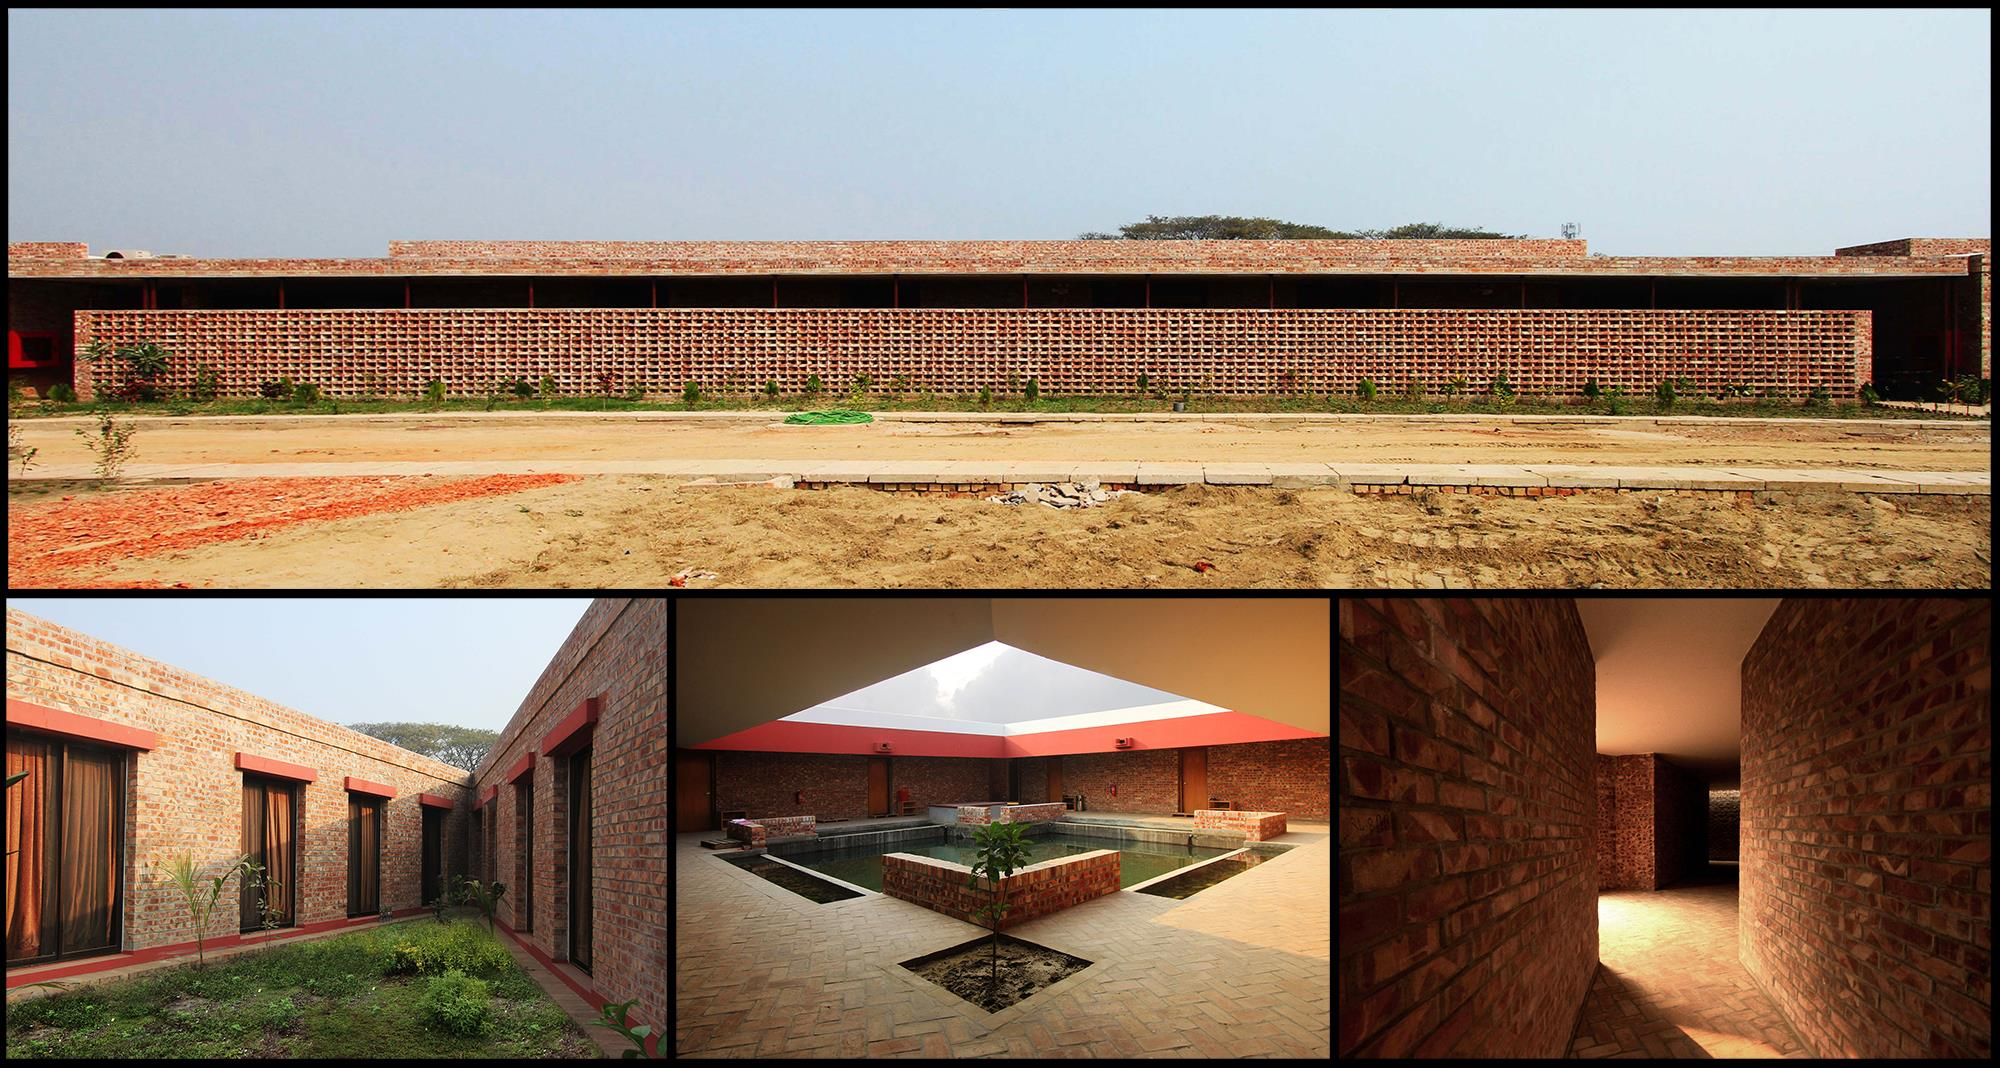 Site Accommodation Facilities for Foreign Construction Staff © Ar. Anup Kumar Basak & Ar. Md. Faysal Kabir